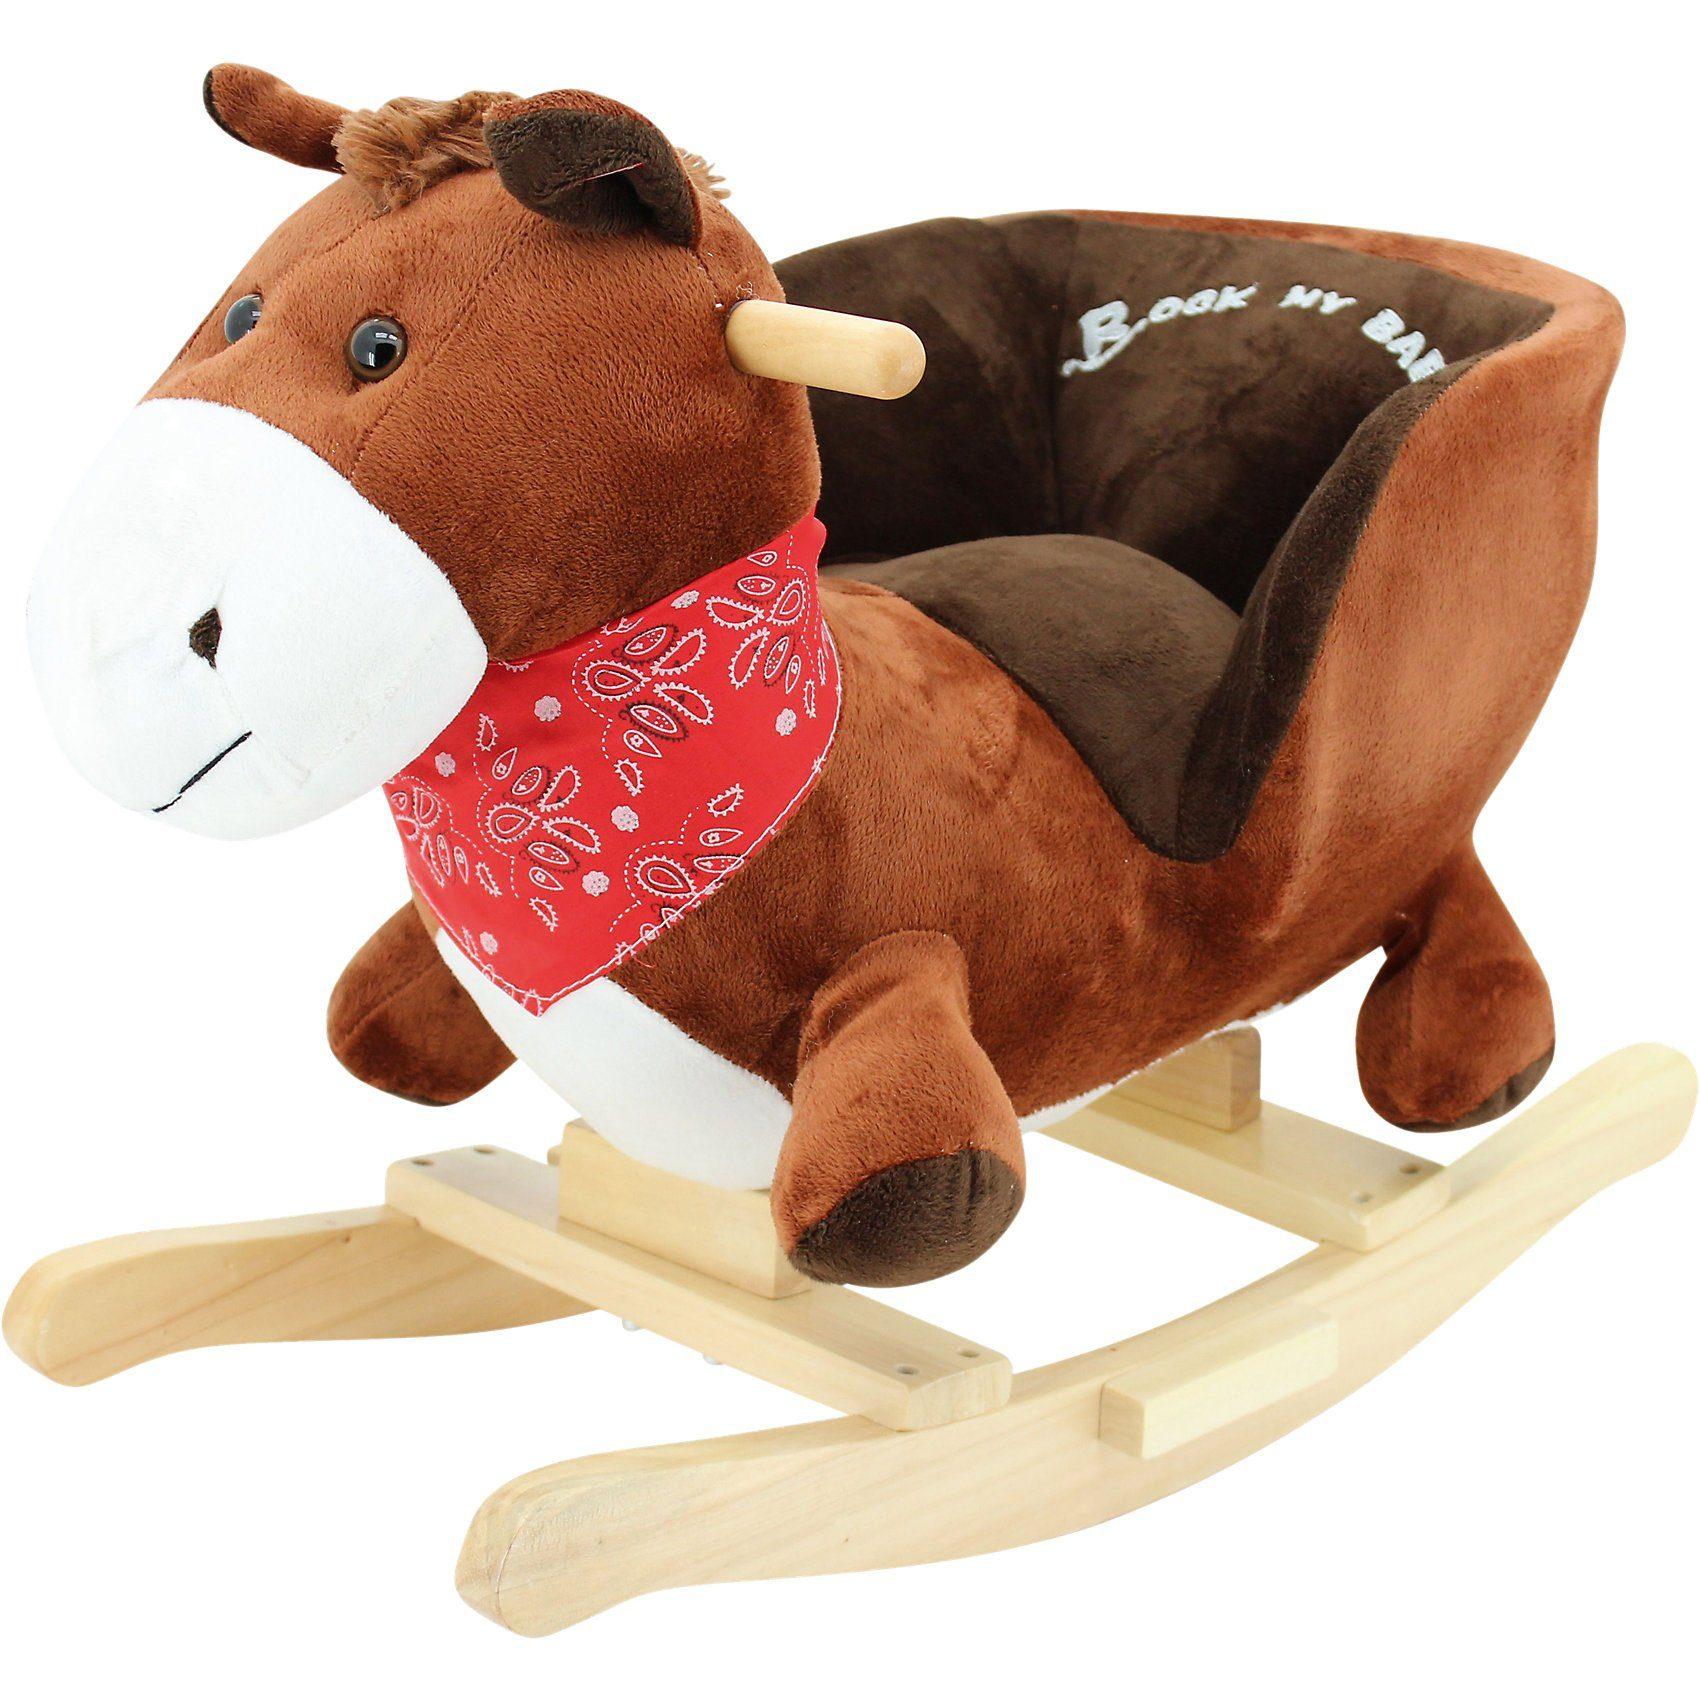 Sweety-Toys Sweety Toys Schaukeltier Pferd Pony mit Funktion Ohr Pferde